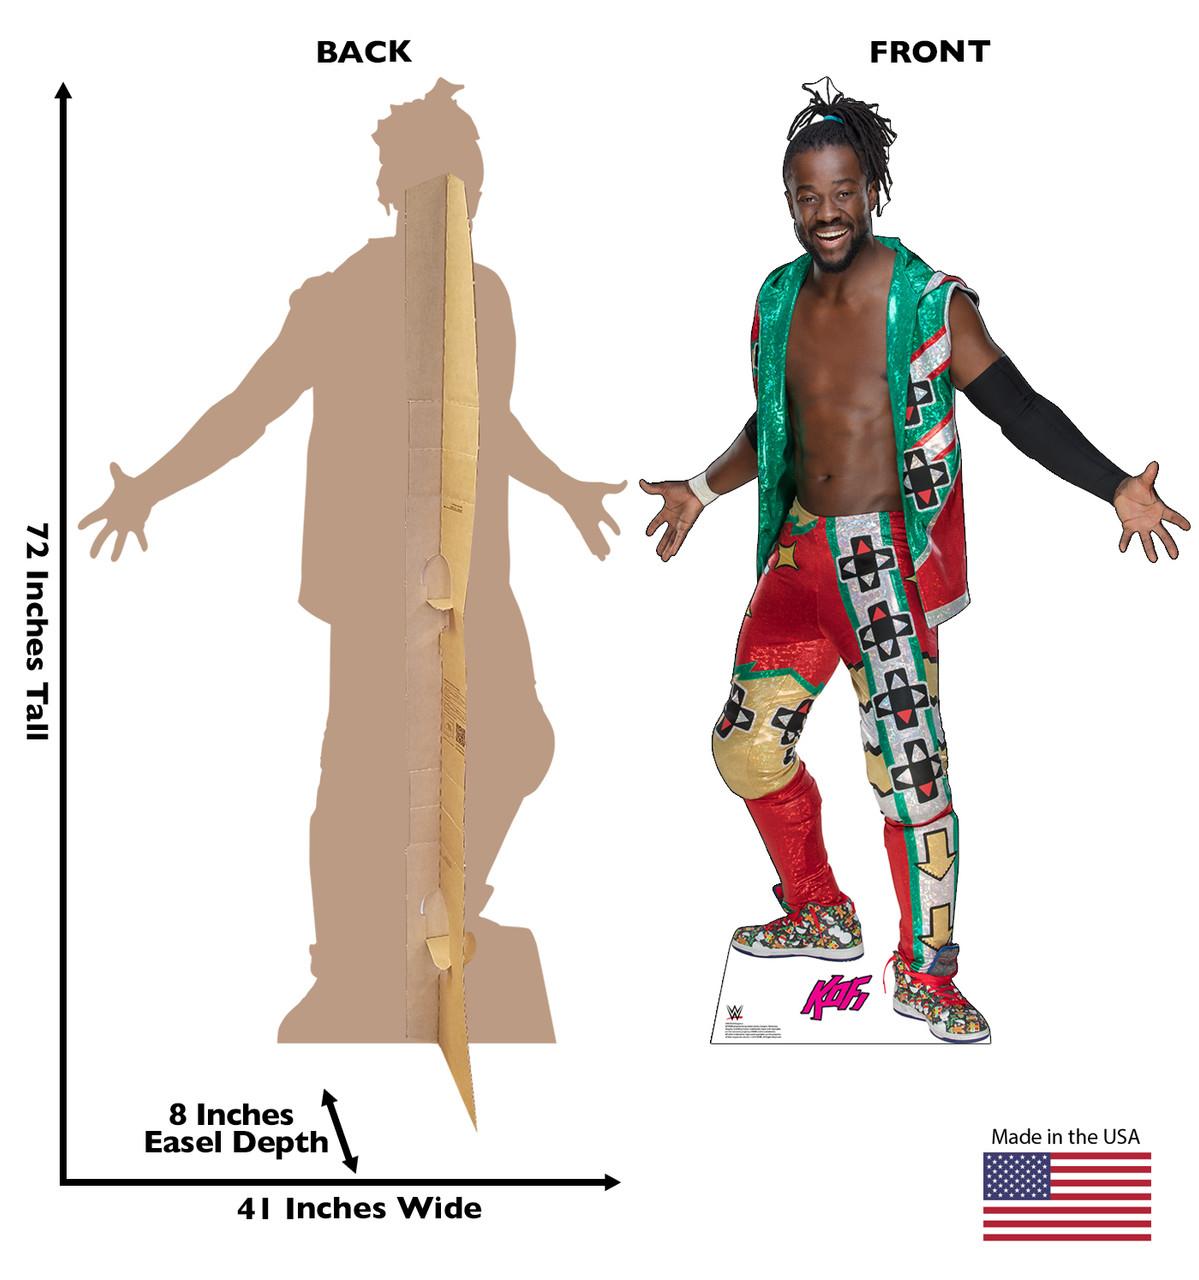 Kofi Kingston WWE - Green Vest Cardboard Cutout Front and Back View